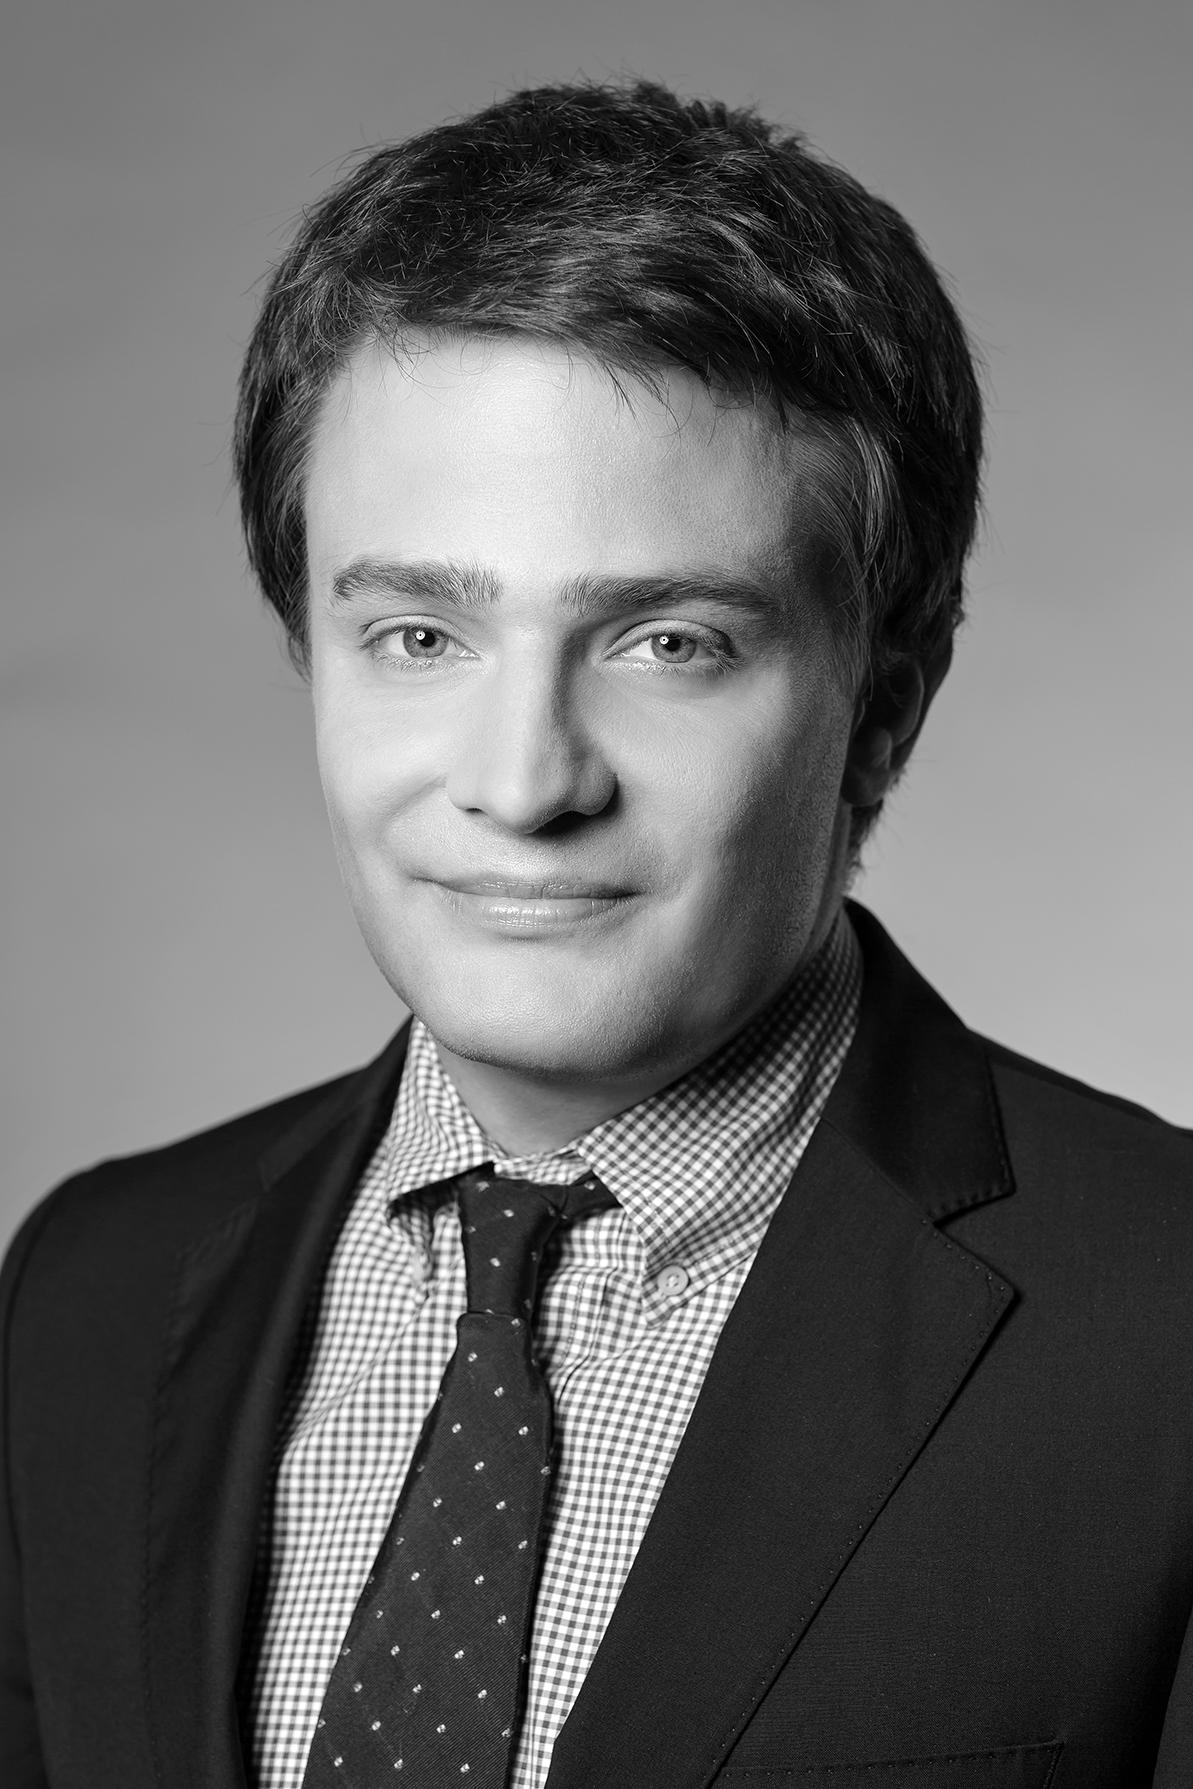 Mgr. Matěj Urban M.Sc., Associate